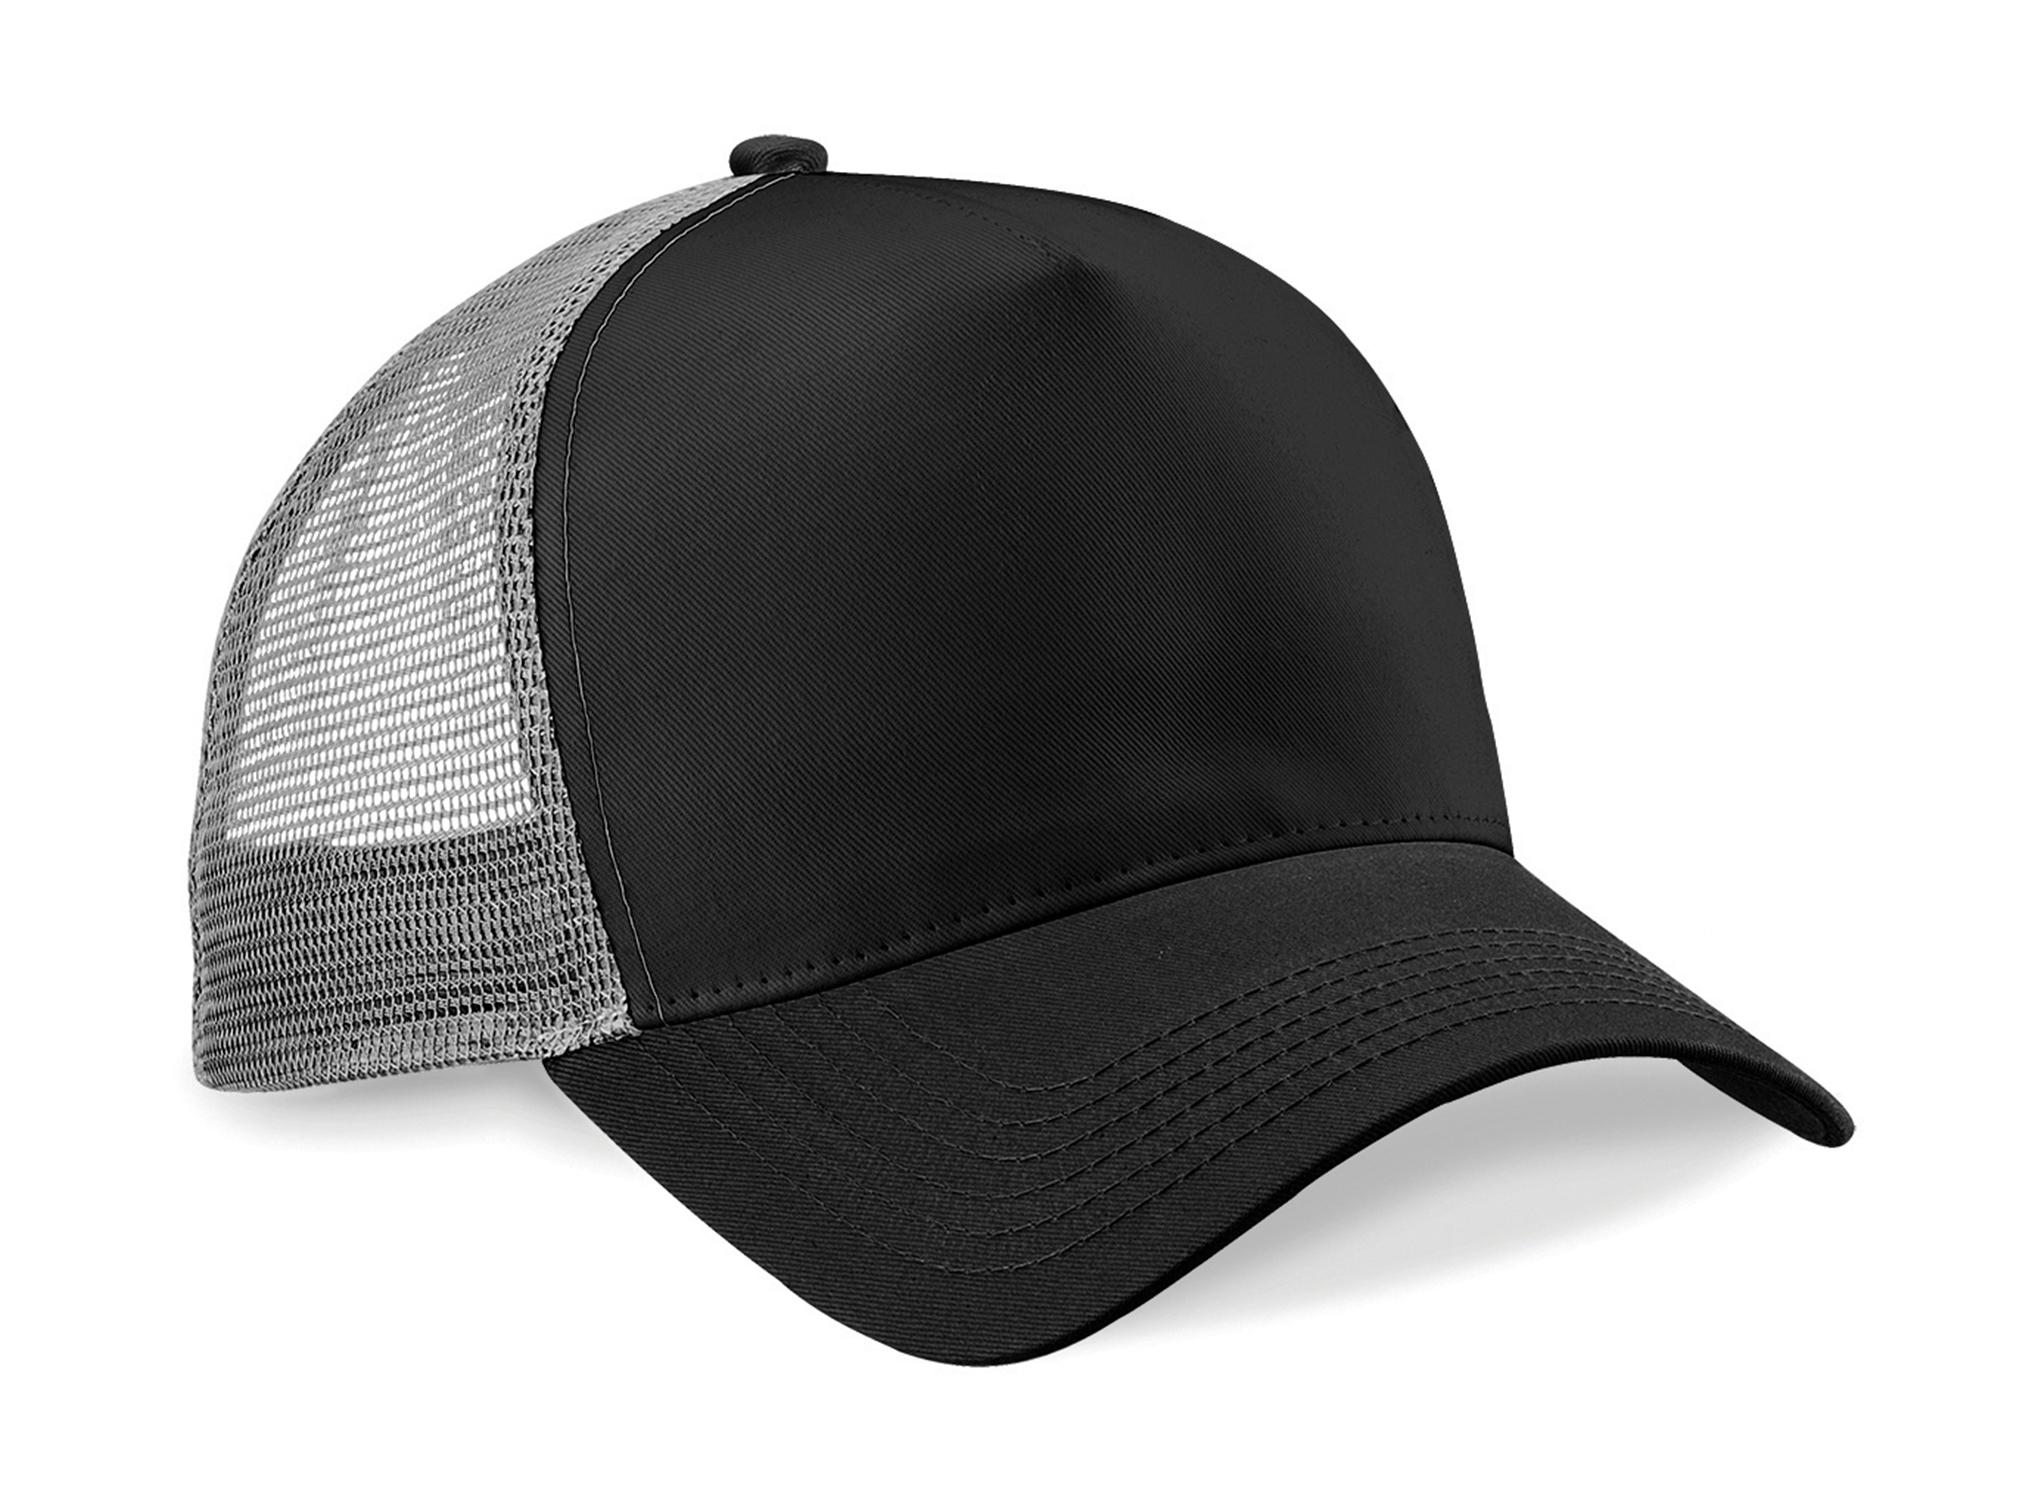 SNAPBACK TRUCKER CAP